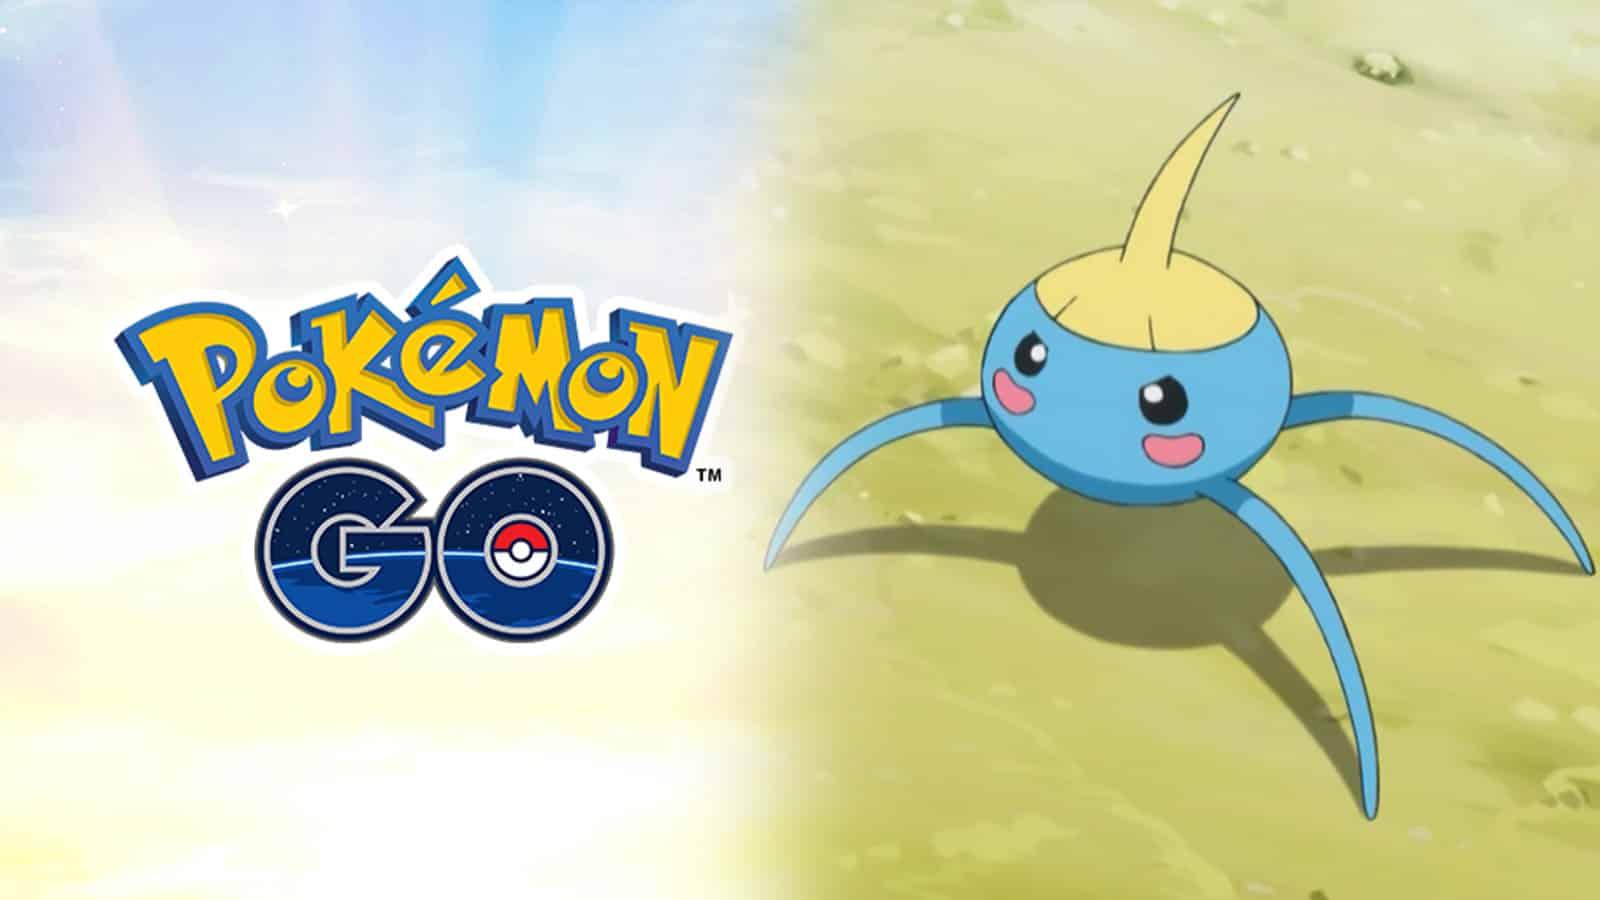 Screenshot of Pokemon Go logo next to Surskit from Pokemon anime.